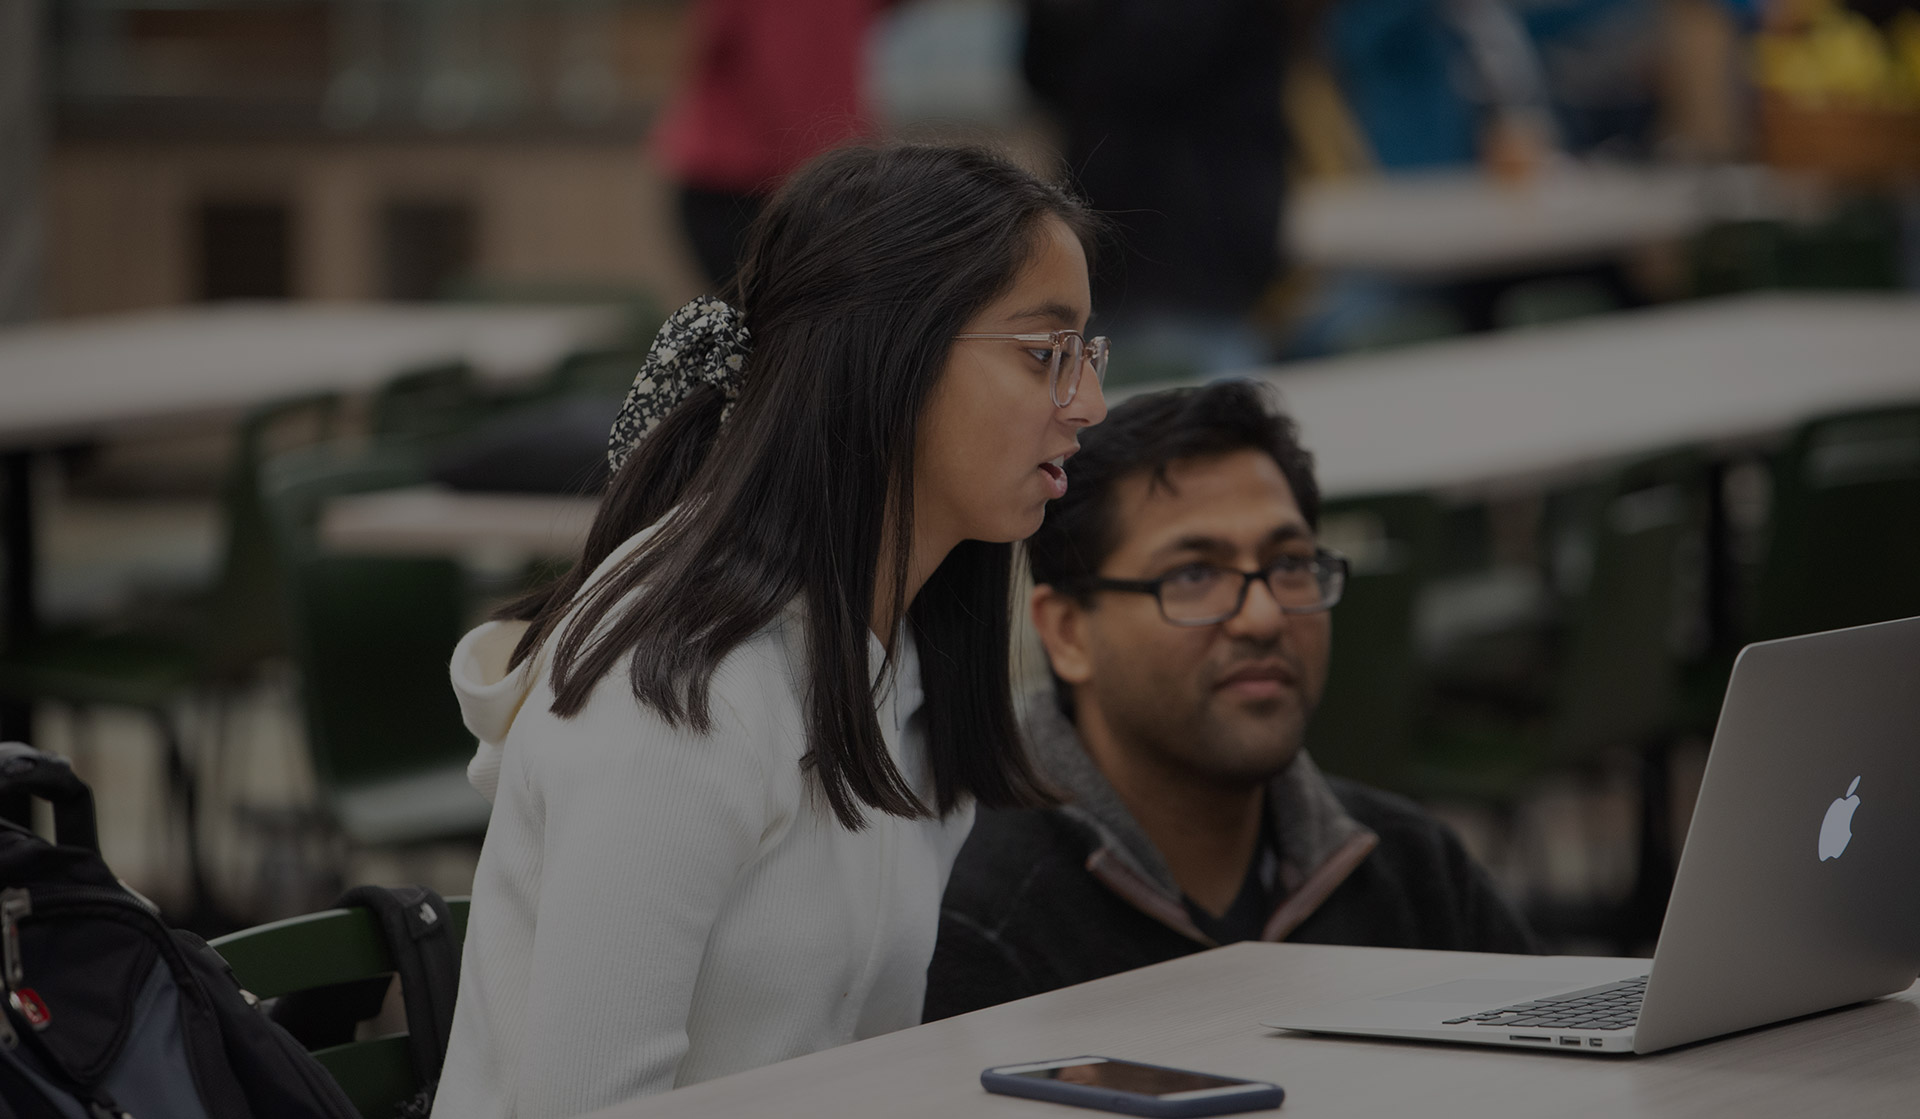 Mentoring A Generation of Entrepreneurs